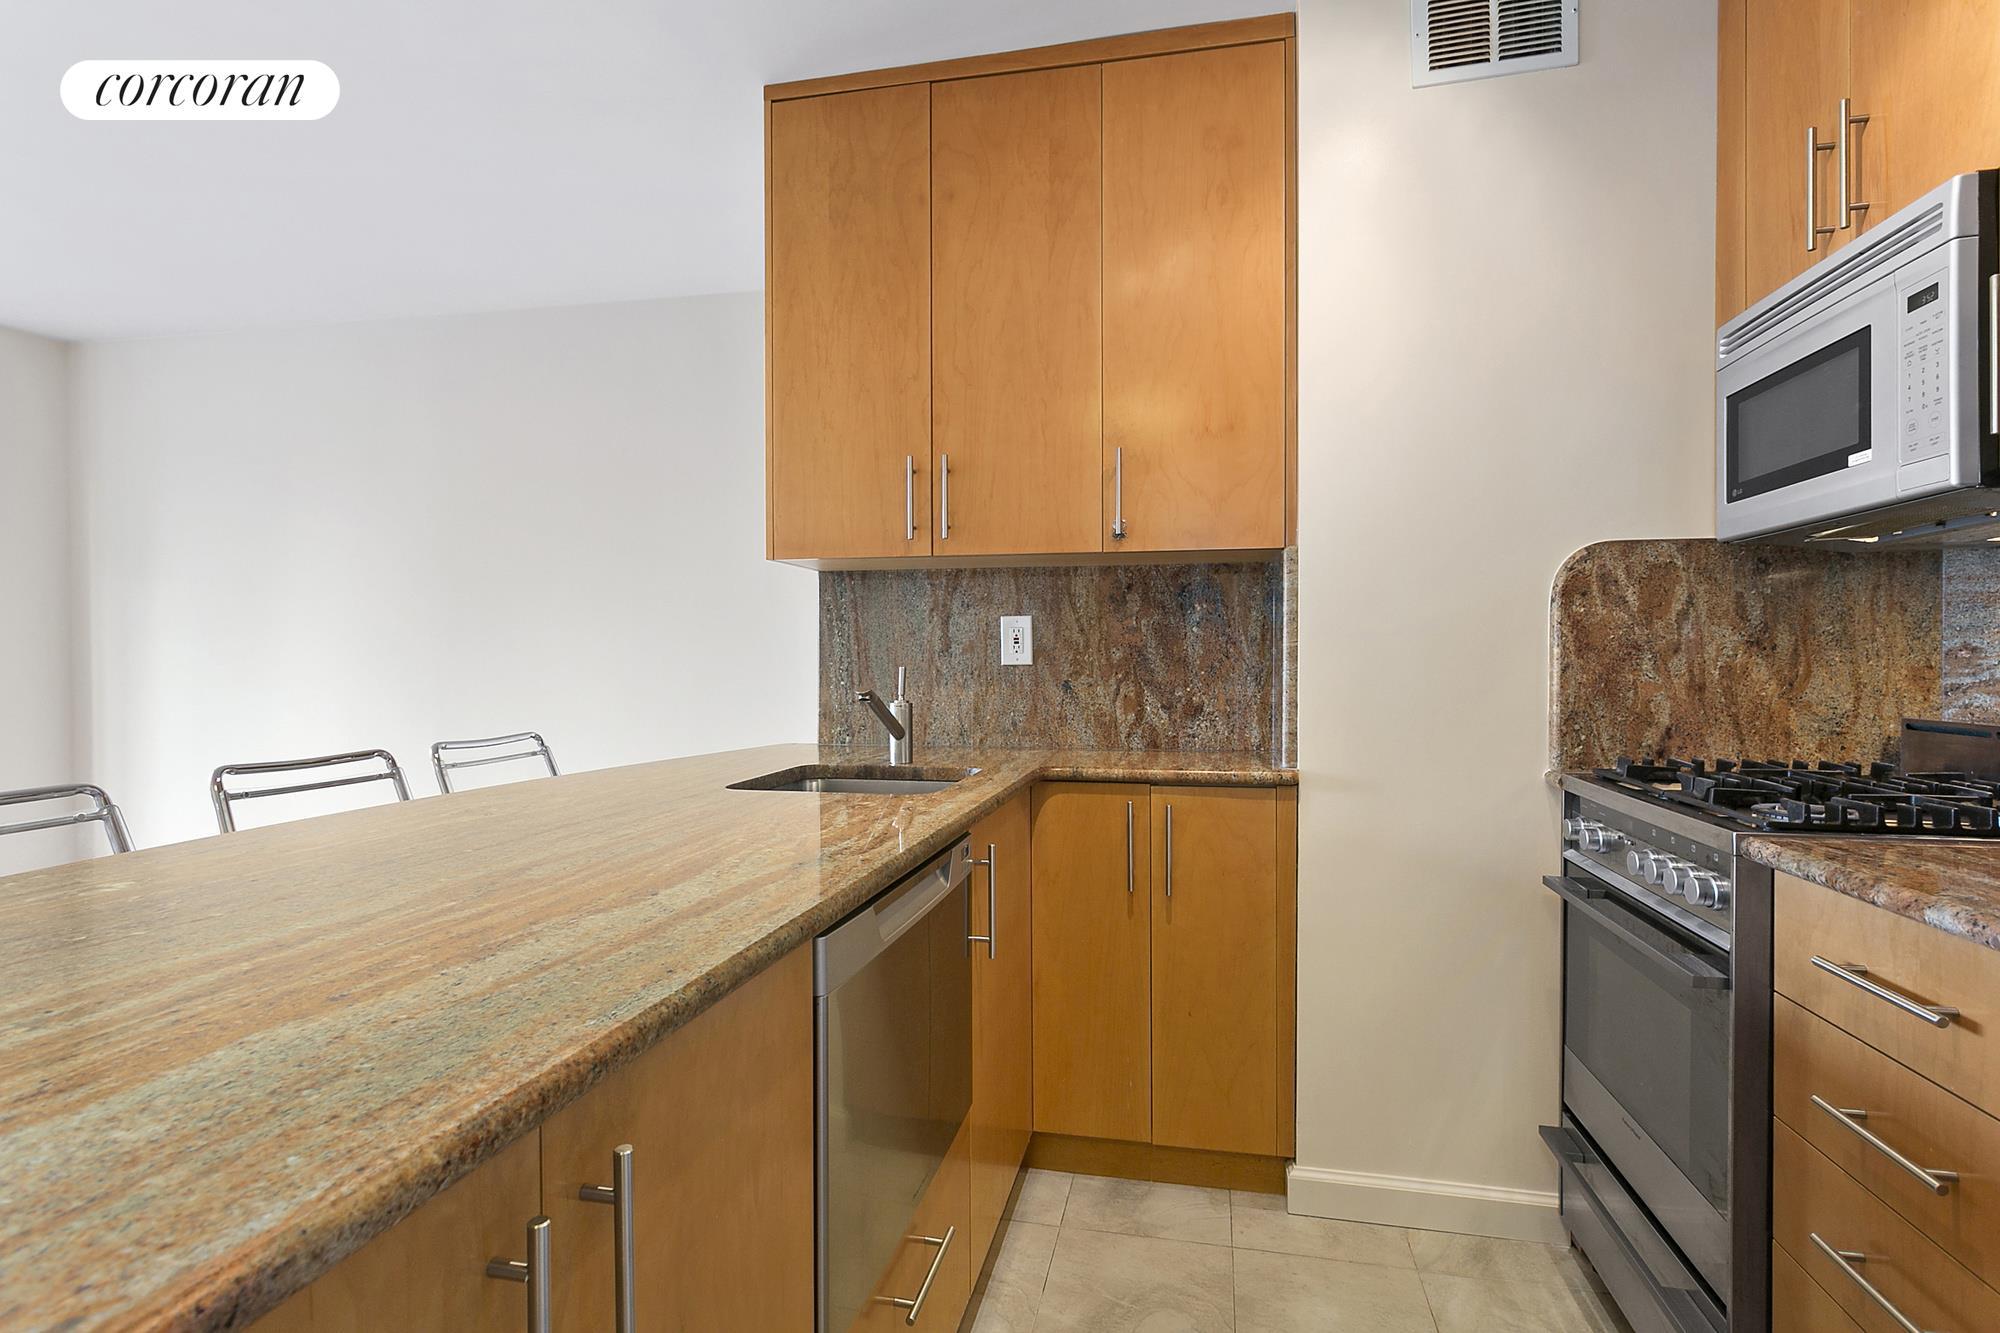 Corcoran 300 East 62nd Street Apt 2501 Upper East Side